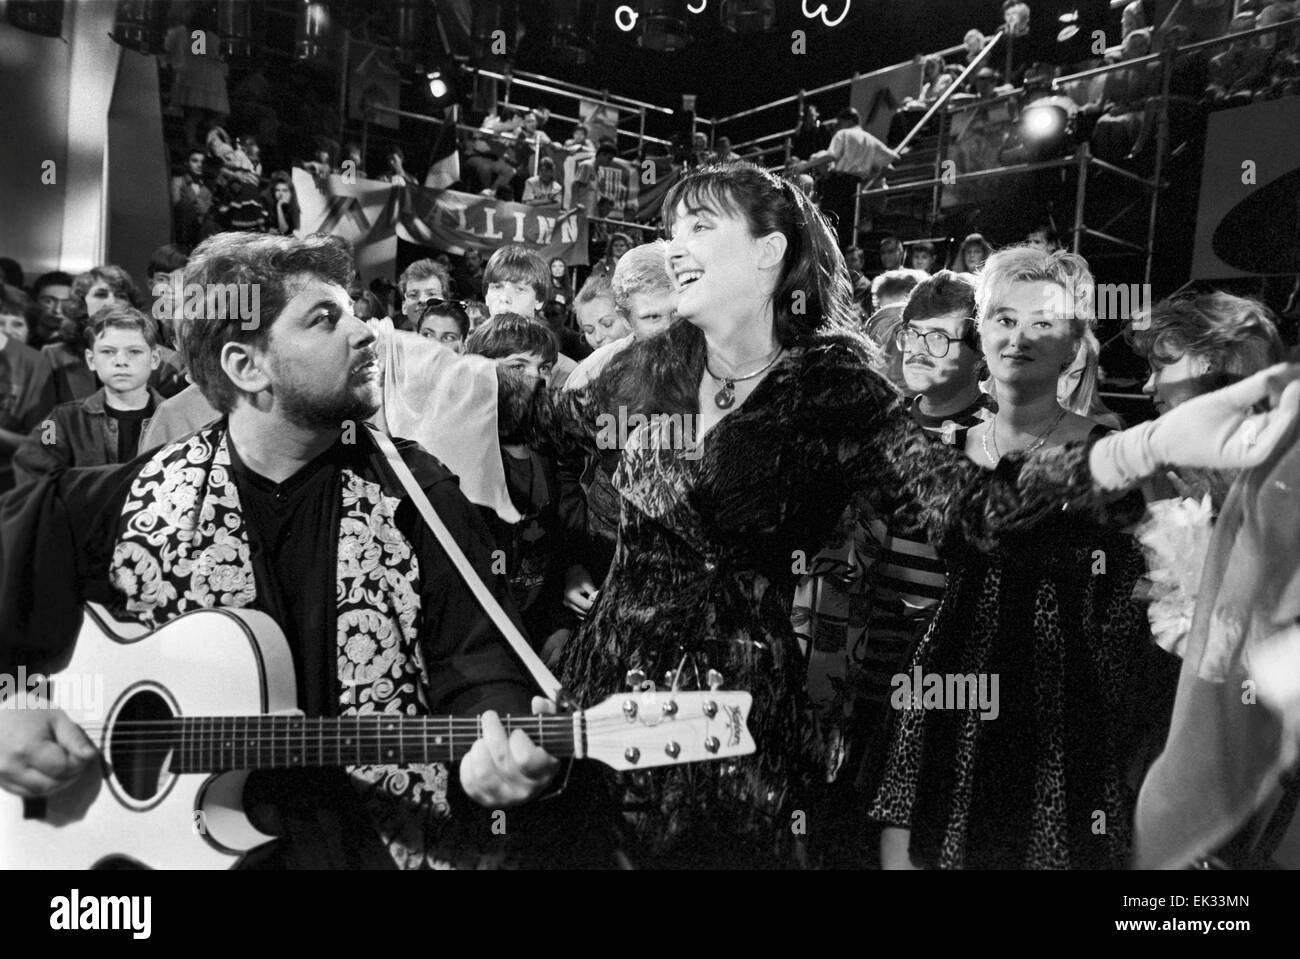 Moscow. Russia. Brain Ring TV show. Lolita and Alexander Tsekalo, members of Akademia pop group, performing. Stock Photo